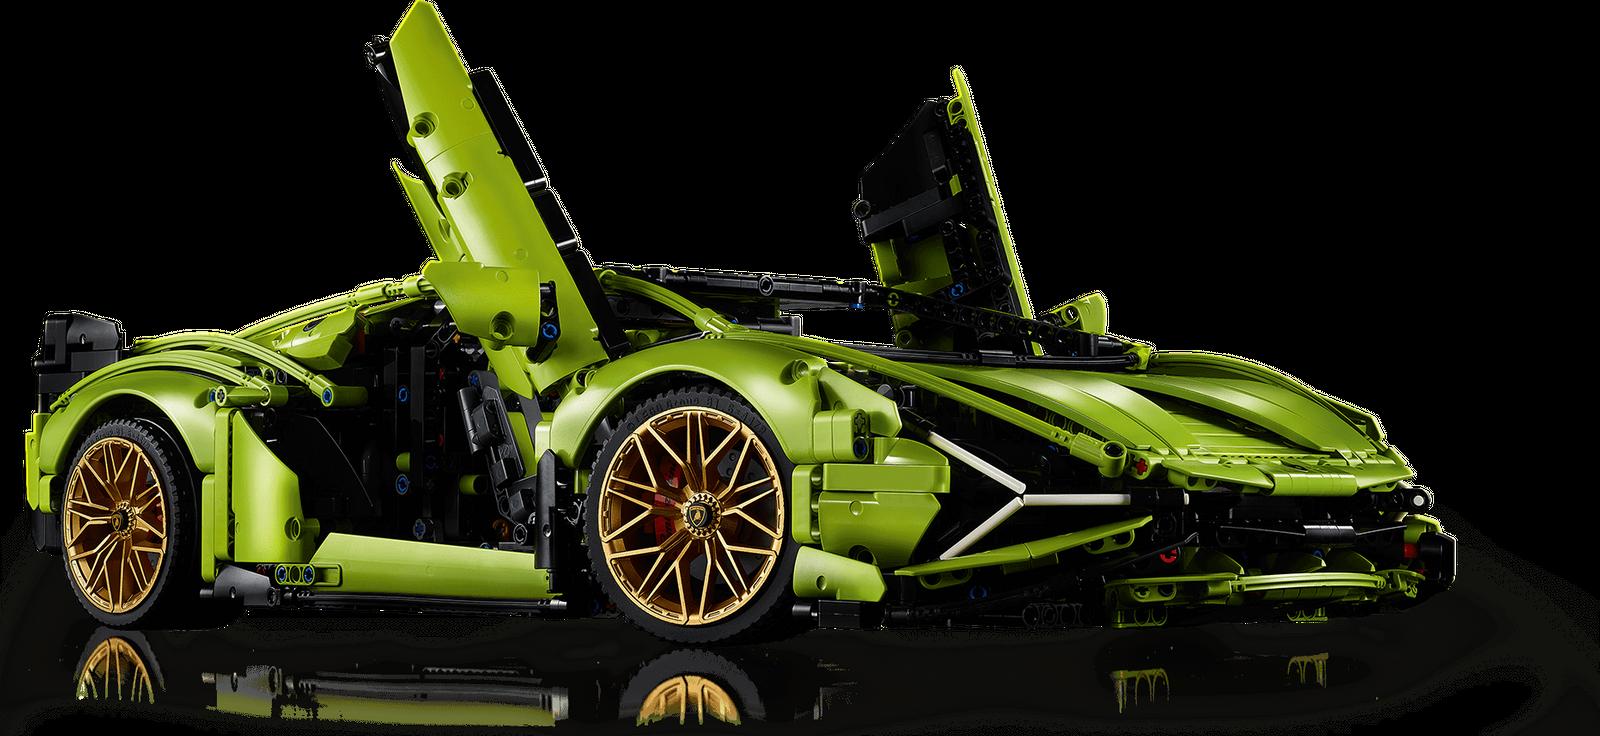 lego-technic-42115-lamborghini-sian-fkp-37-2020-3 zusammengebaut.com